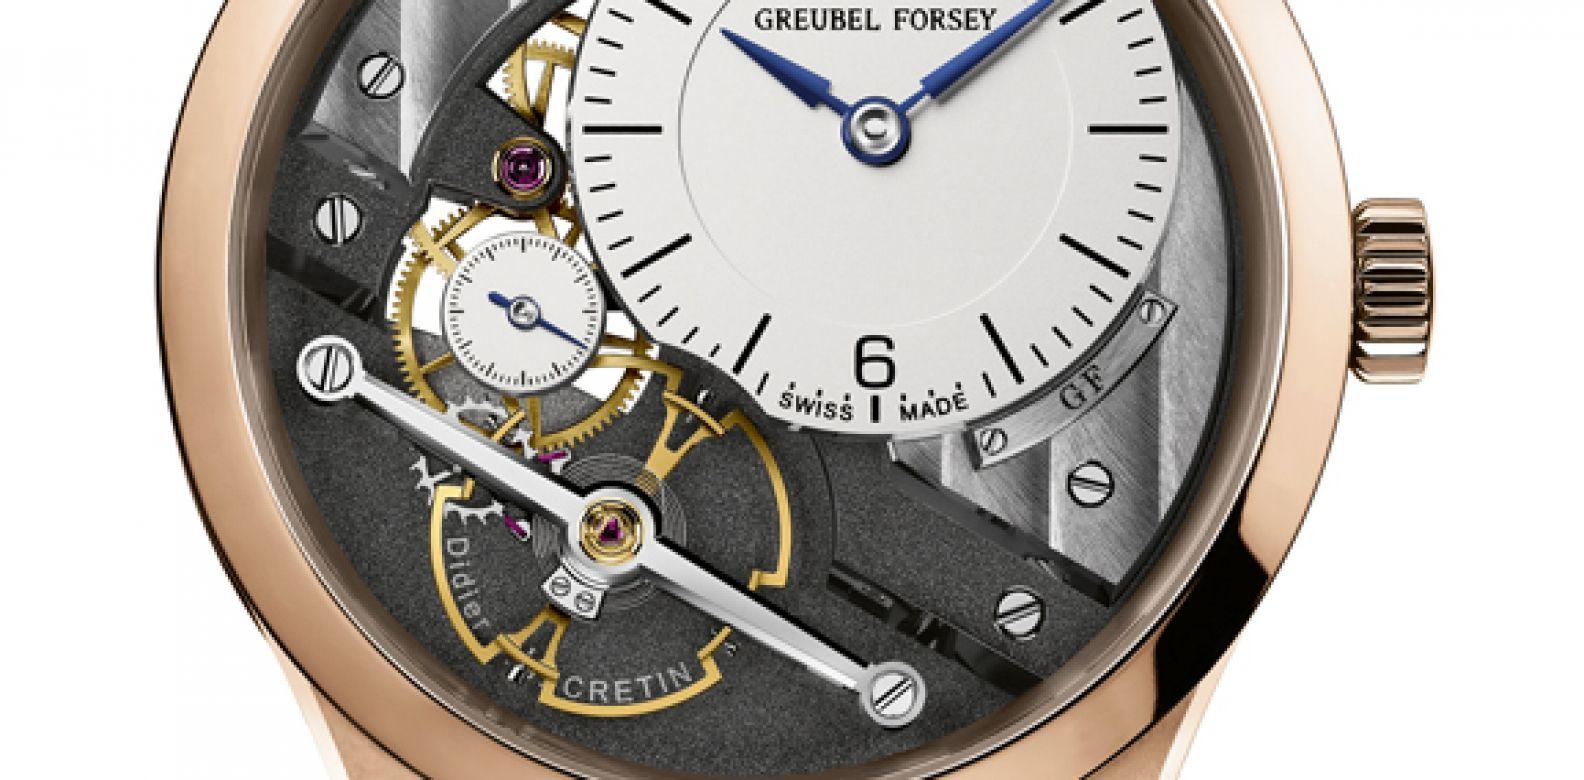 Greubel Forsey Signature 1